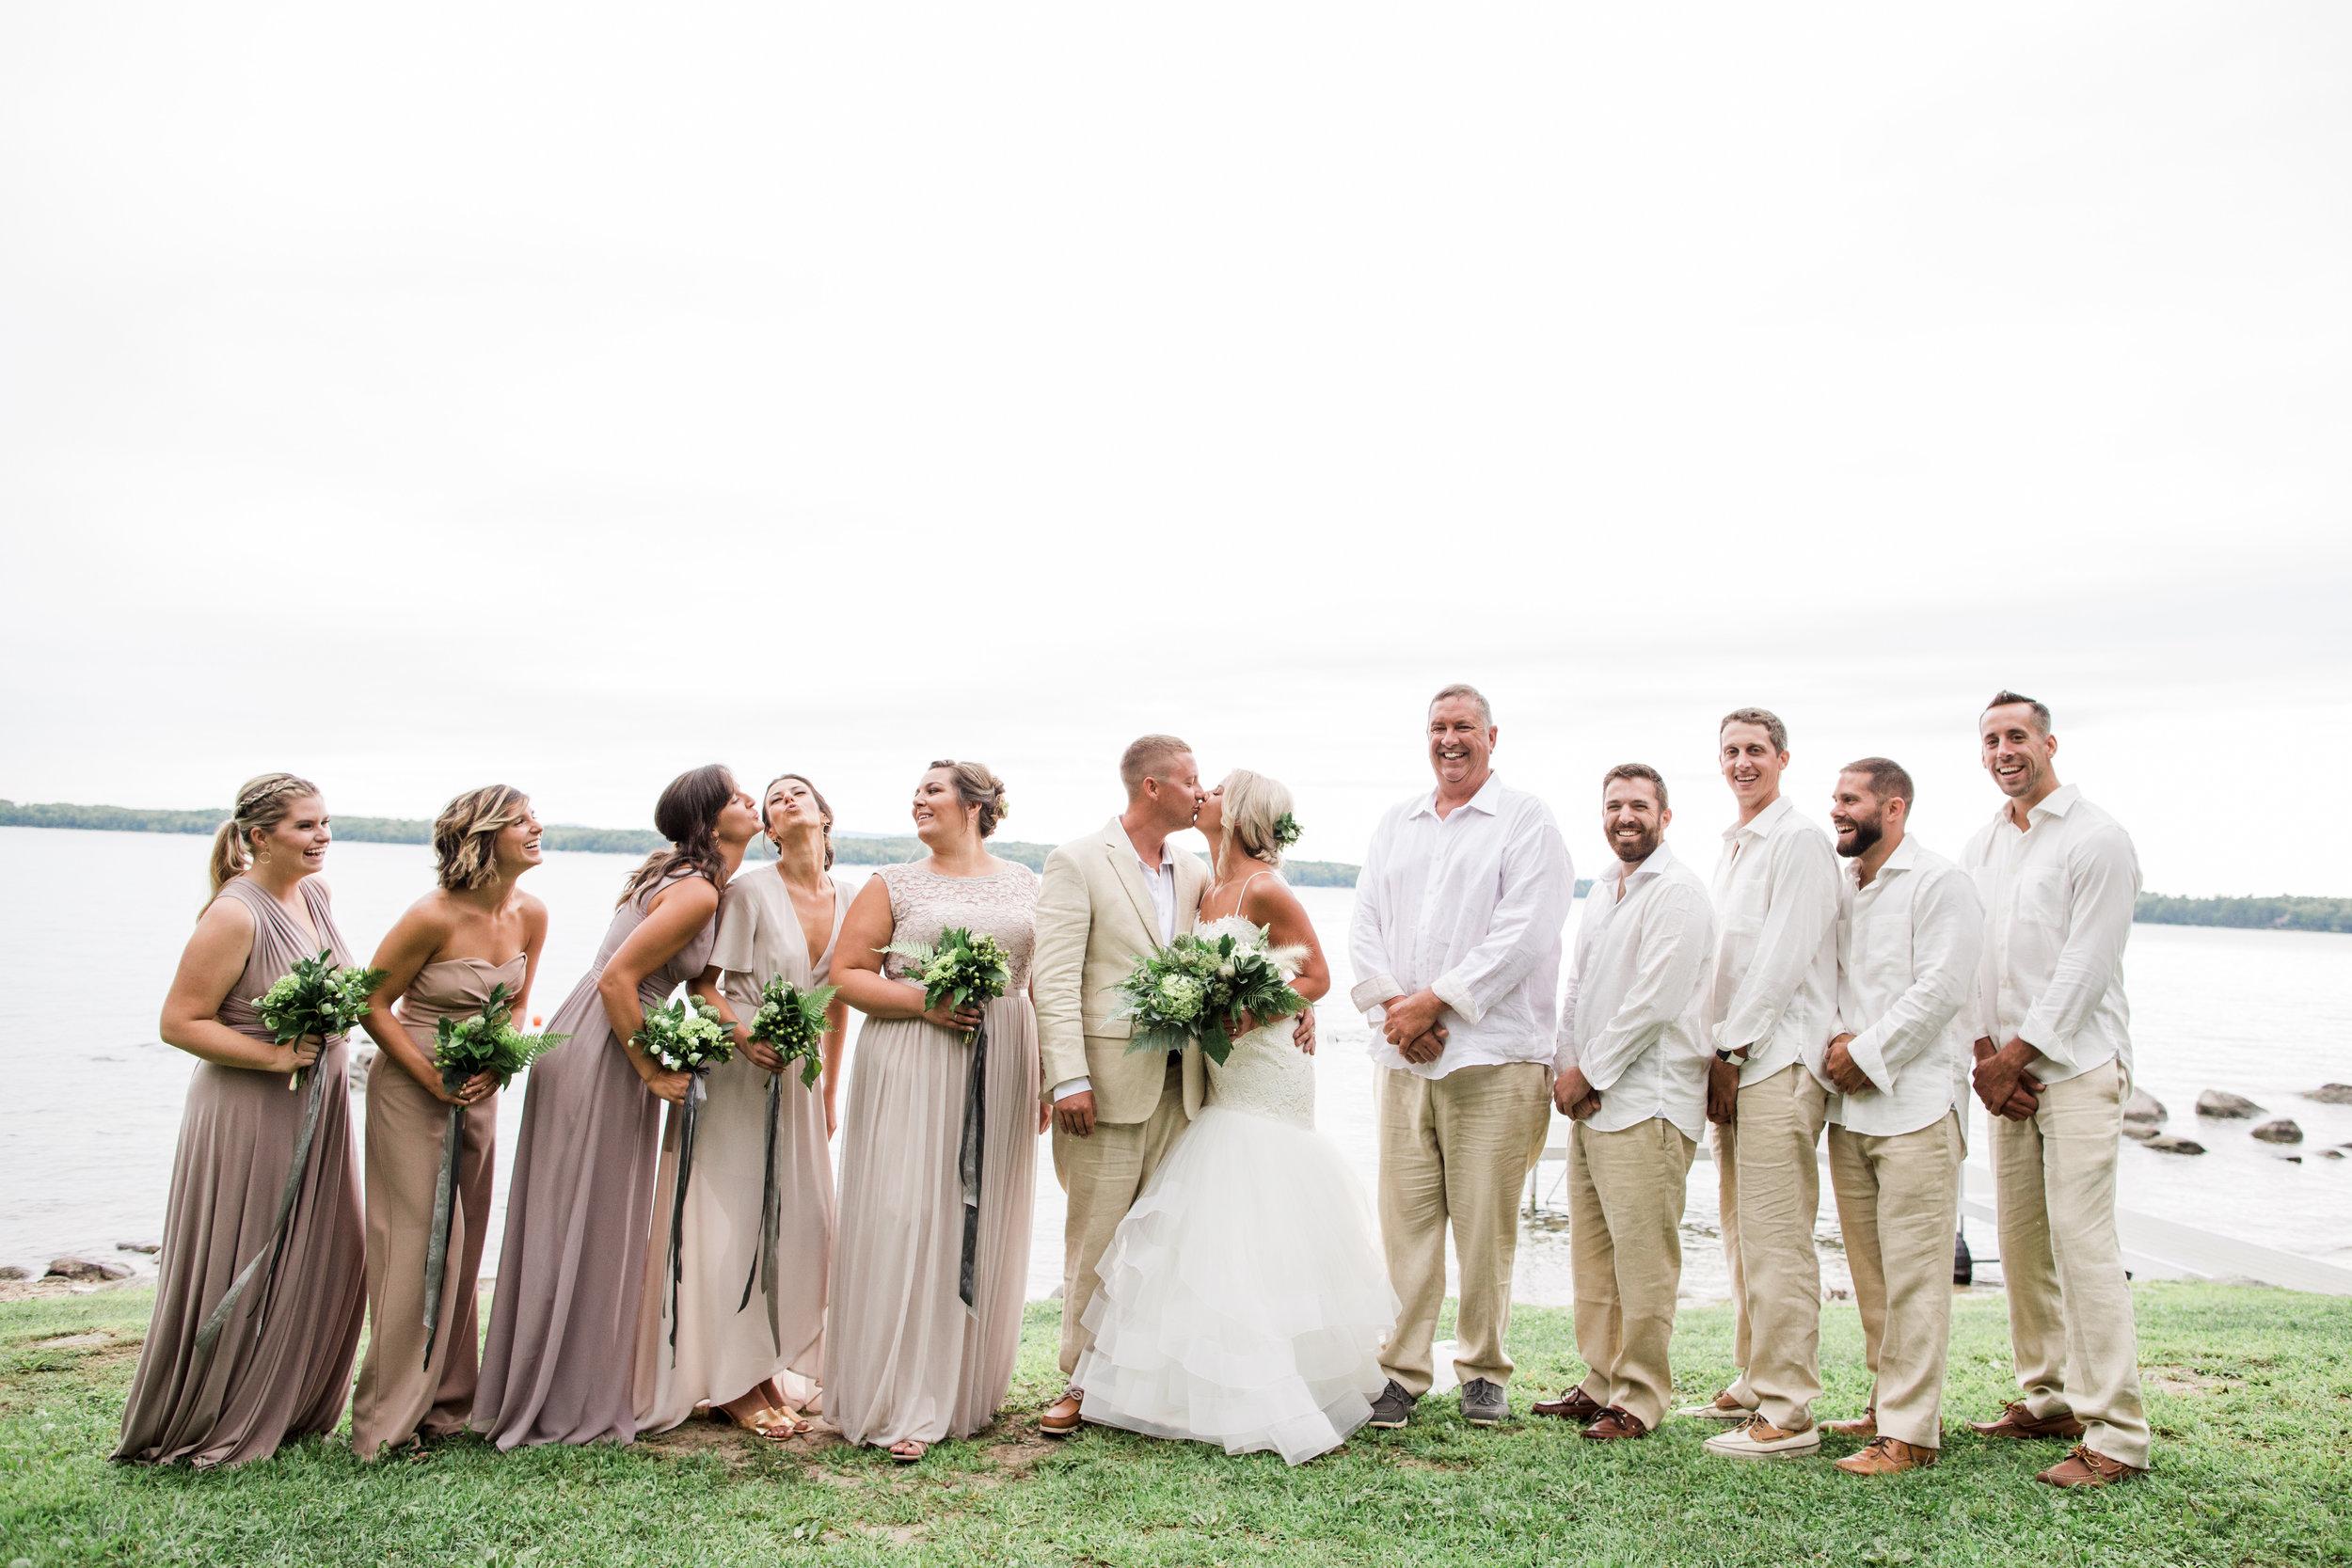 Watershed_Floral_Standish_Maine_Wedding_631.jpg